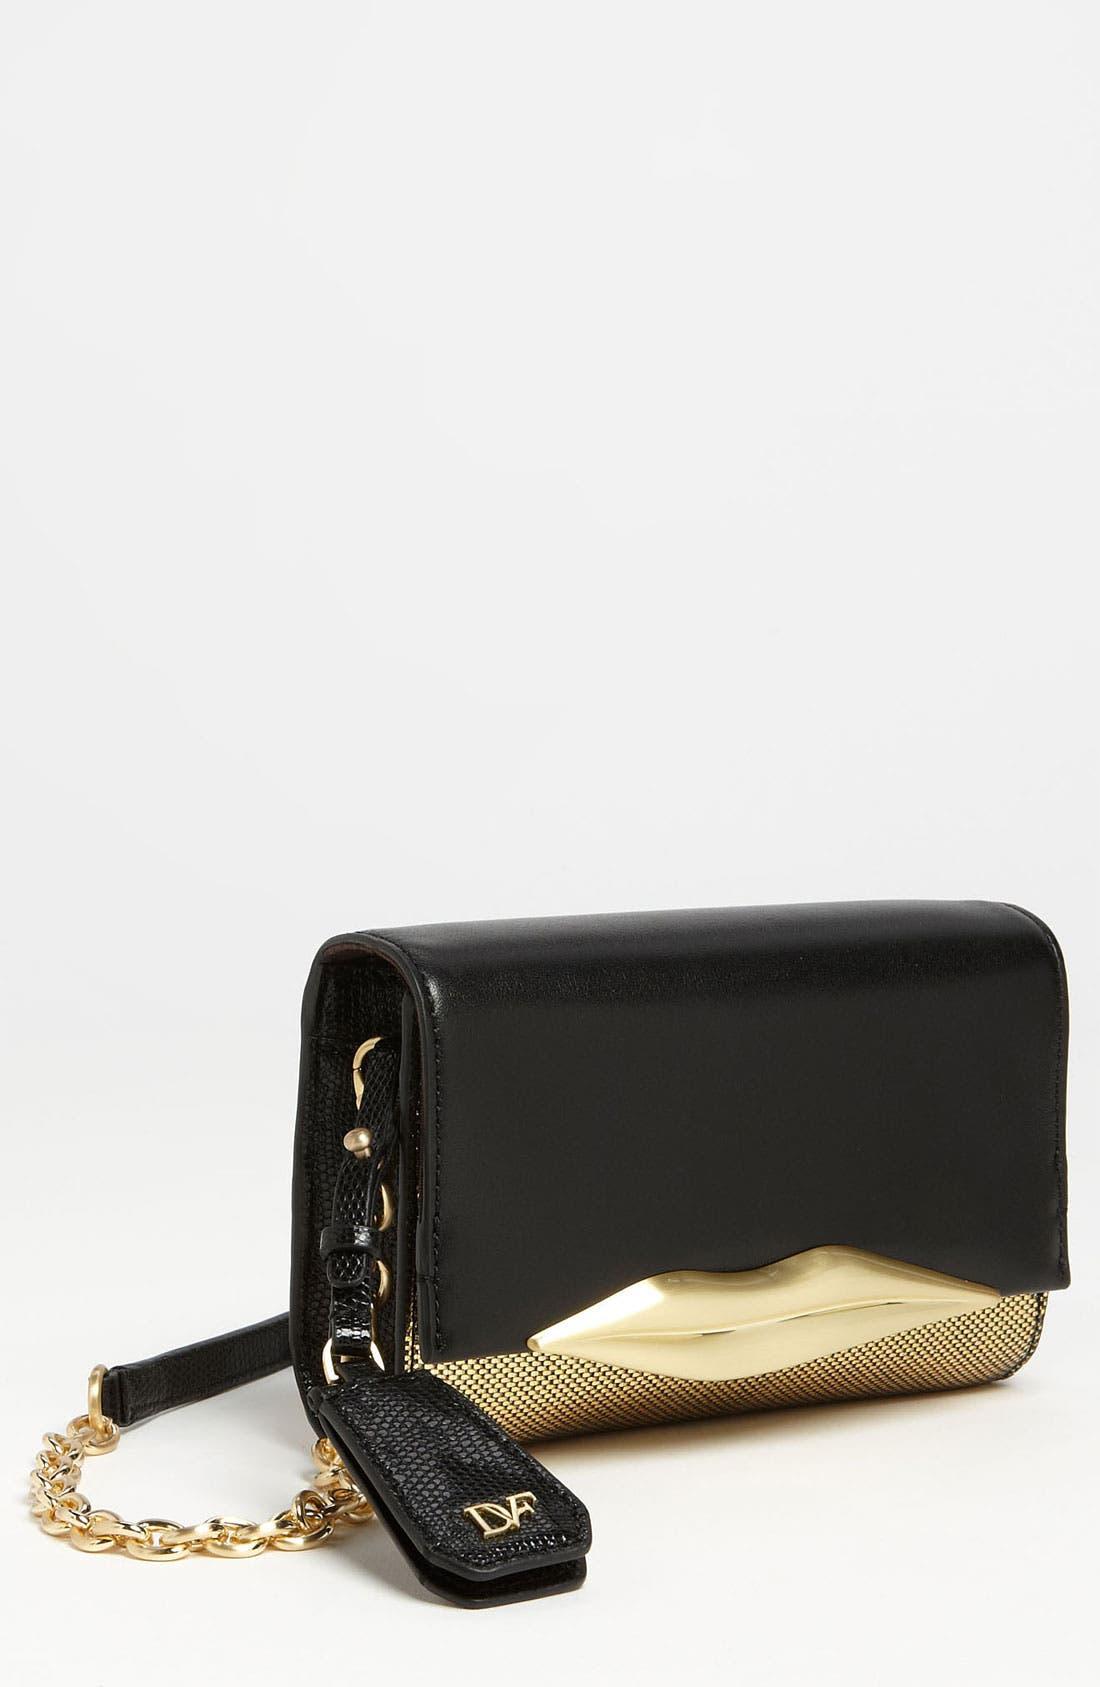 Alternate Image 1 Selected - Diane von Furstenberg 'Lips - Mini' Metallic Leather Clutch